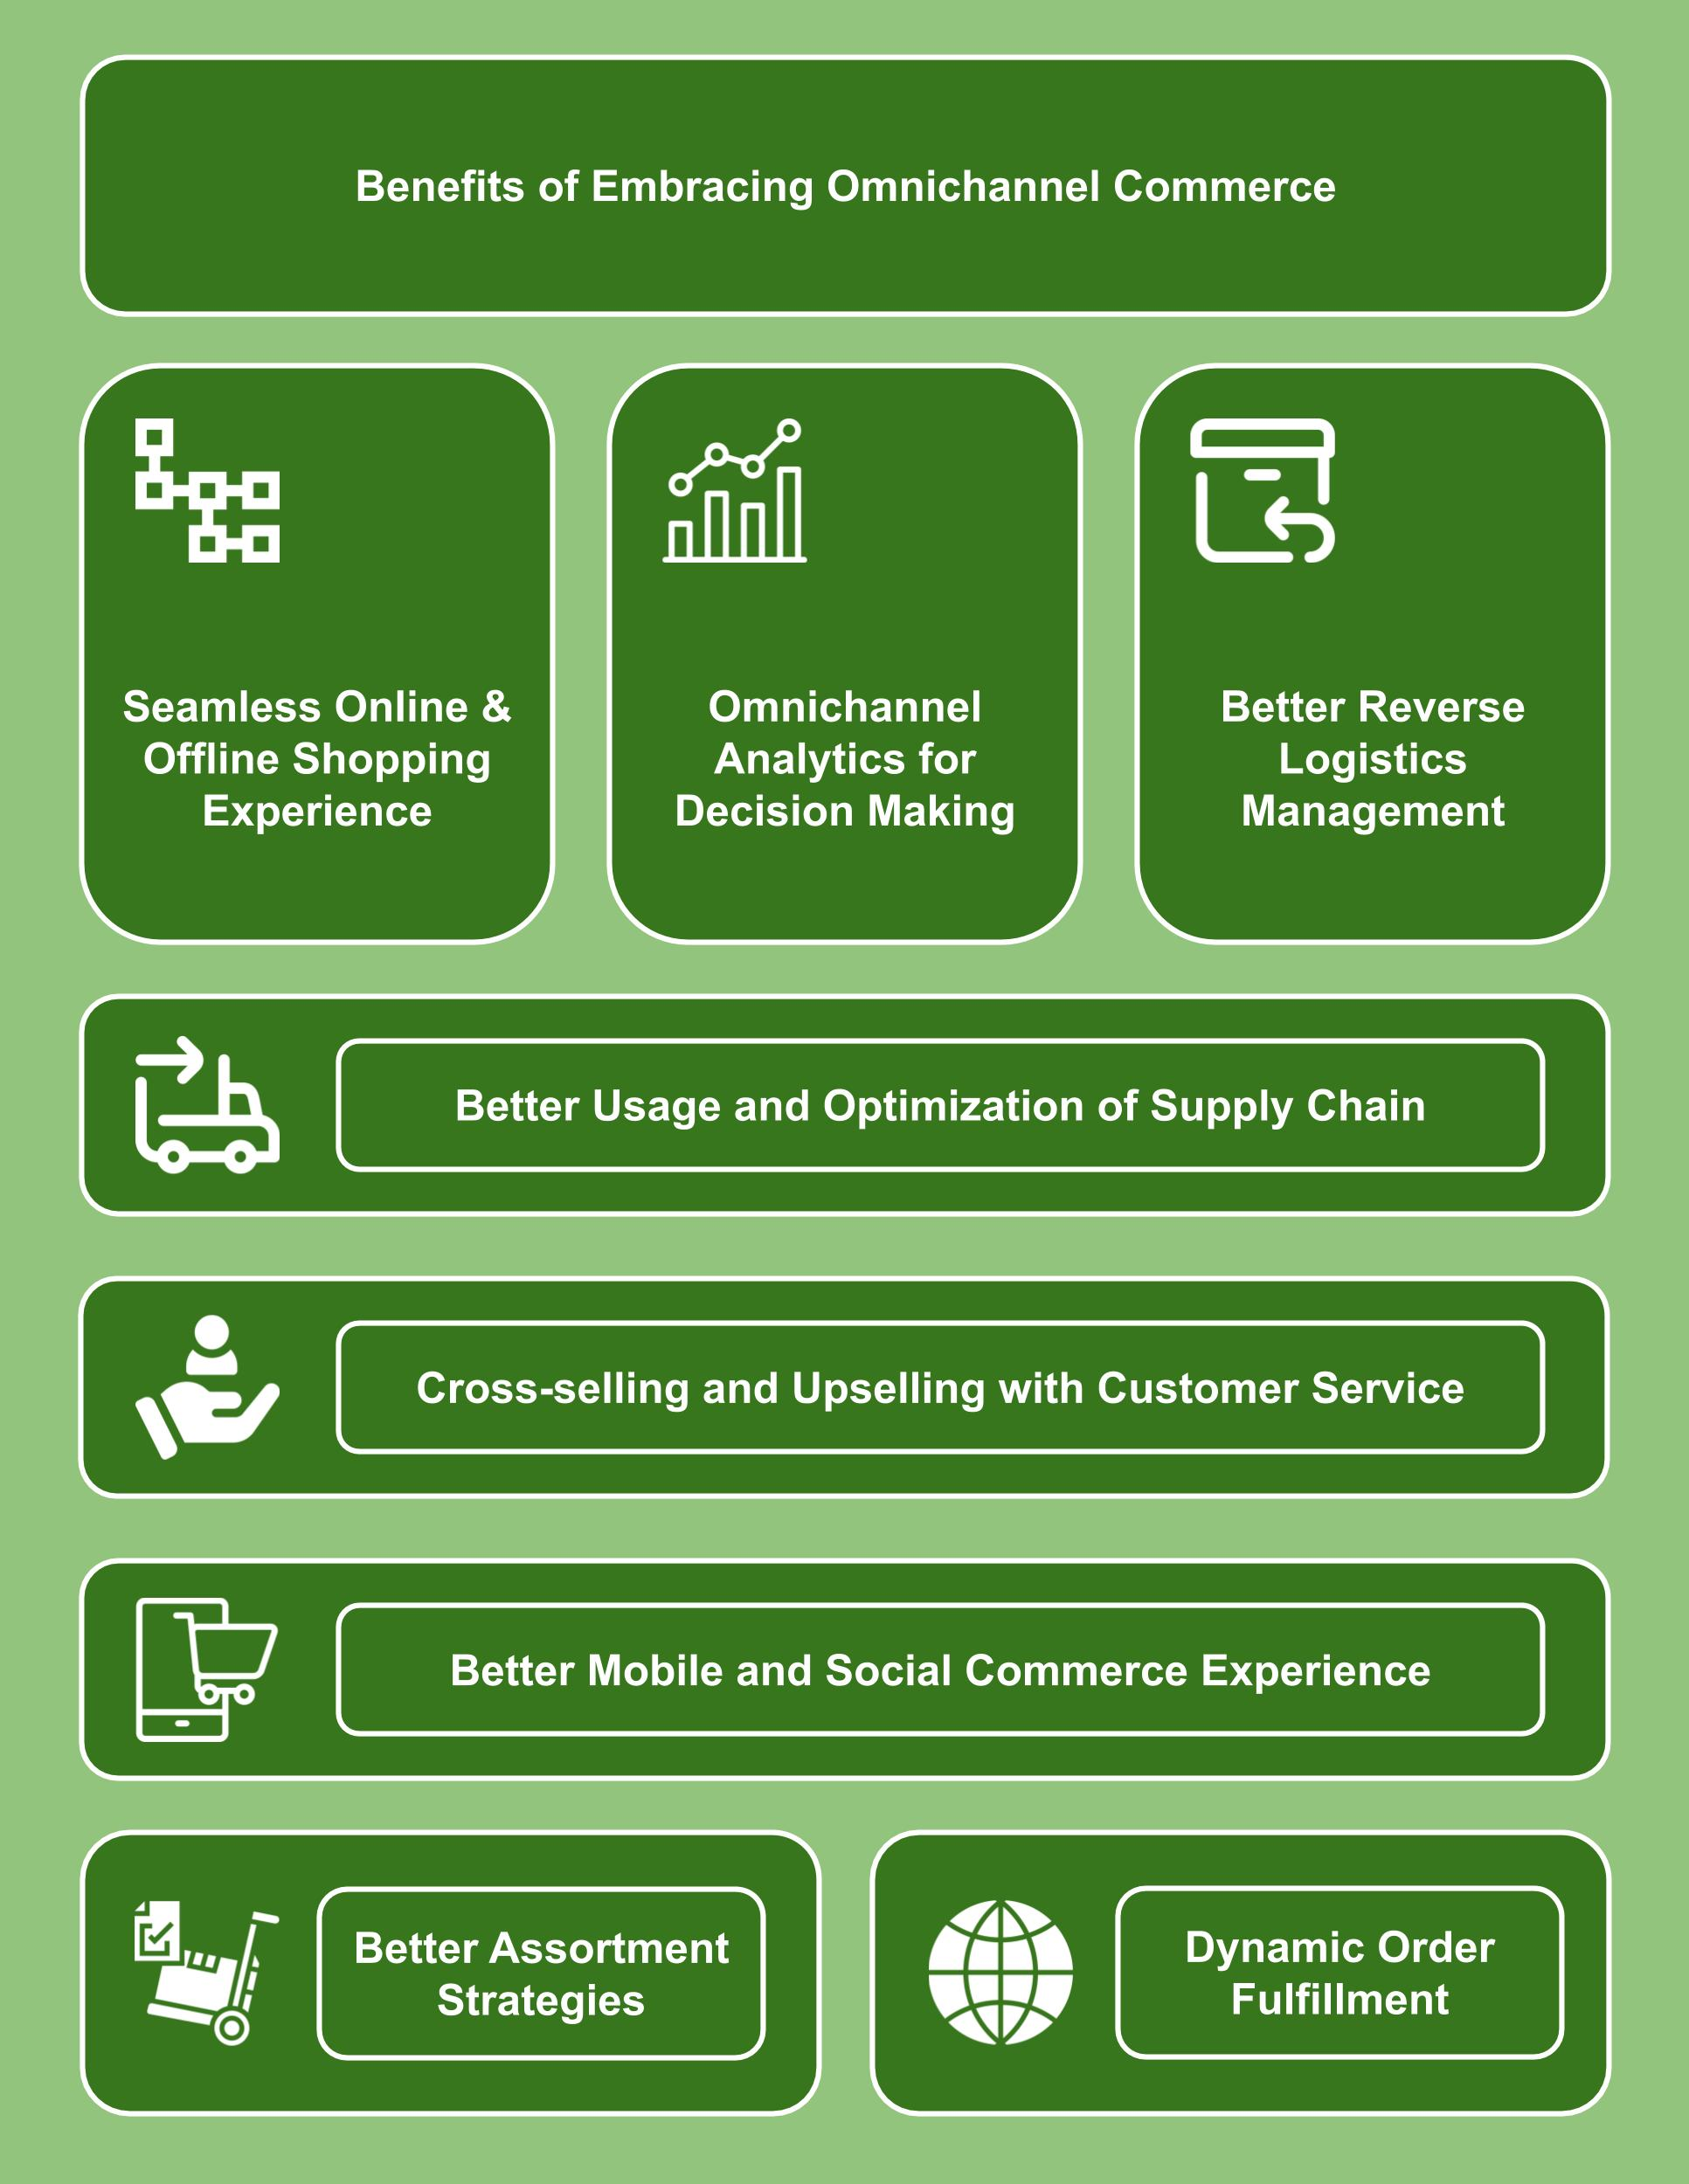 Mini Infographic - Benefits of Embracing Omnichannel Commerce